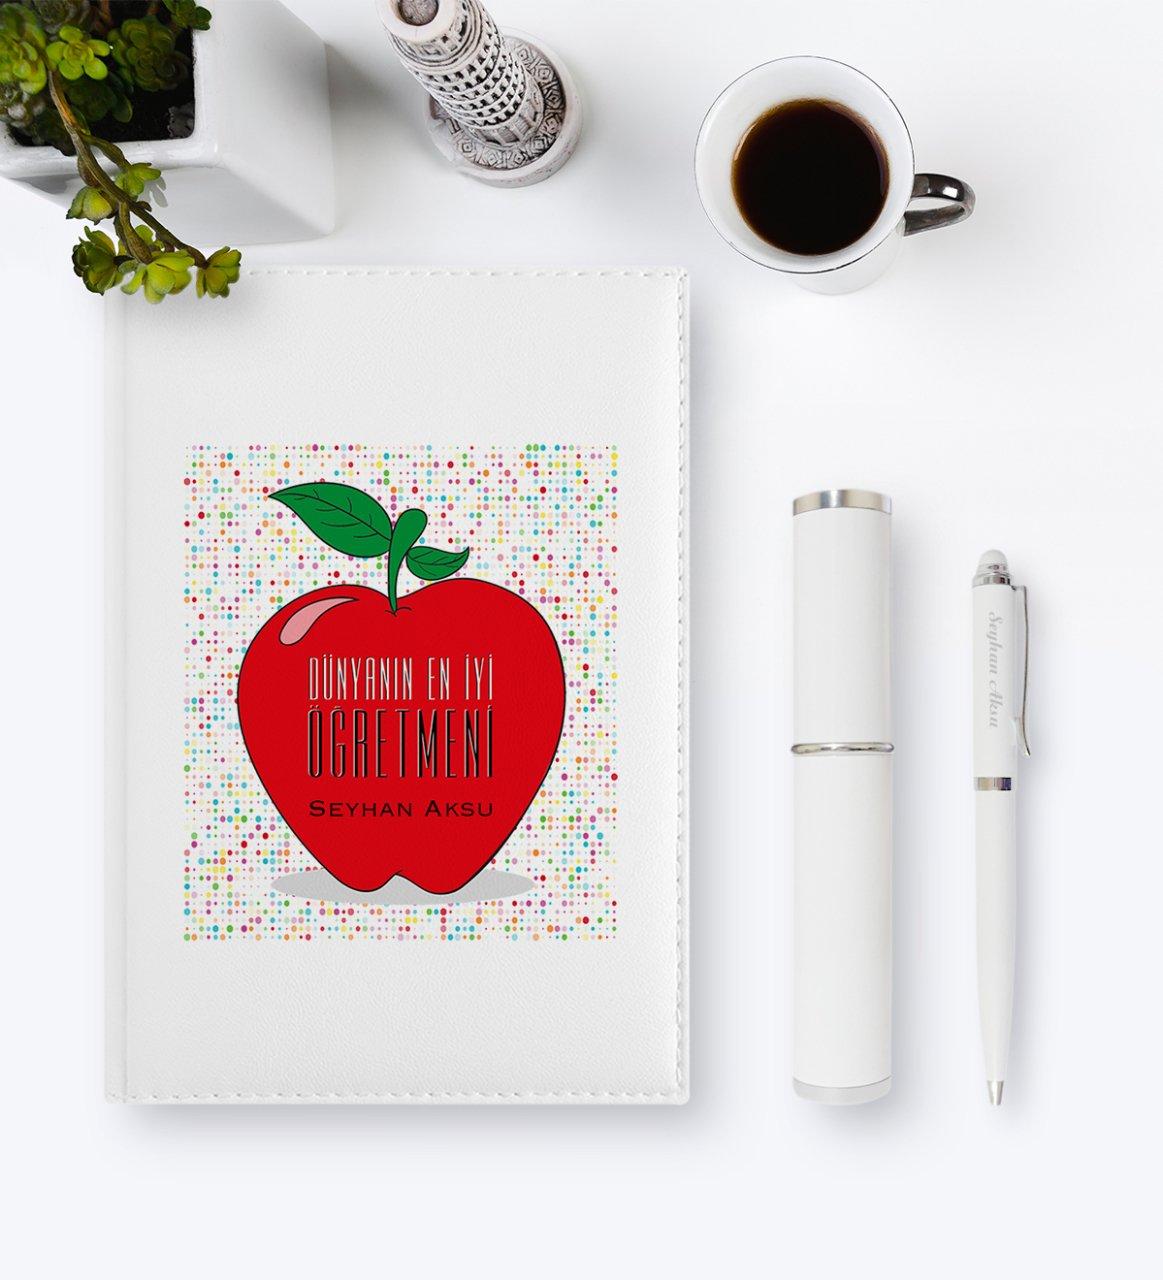 Personalized World Best Teacher 2020 Leather Organizer & Pen Gift Set-11